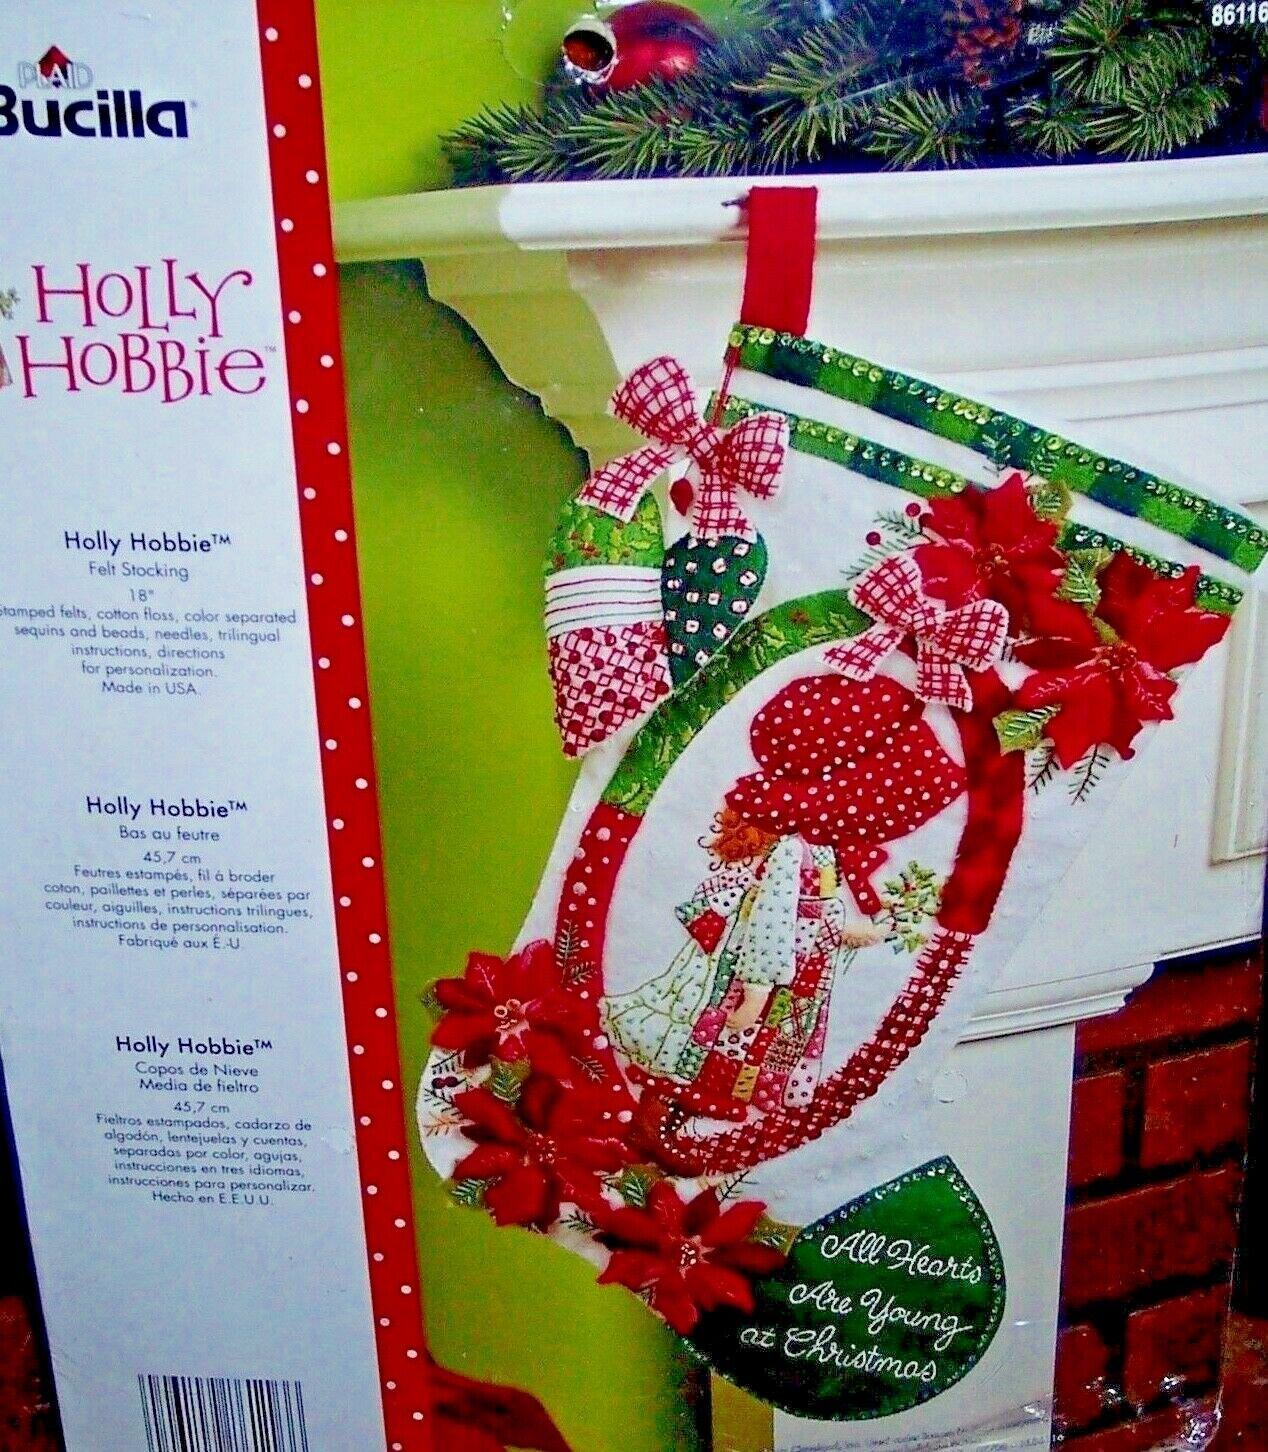 "Bucilla Holly Hobbie ~ 18/"" Felt Christmas Stocking Kit #86116 Poinsettias"